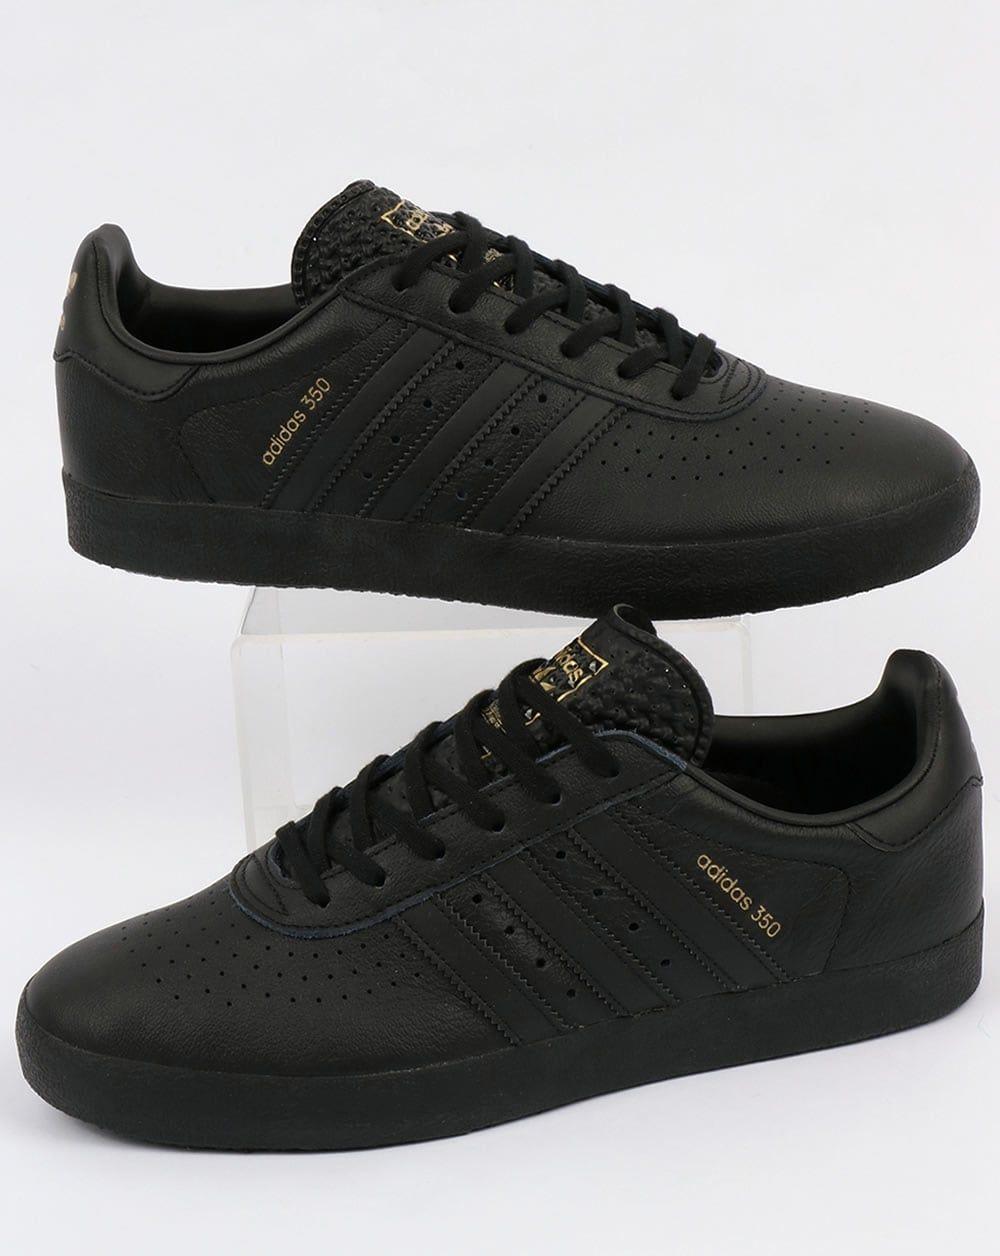 Adidas 350 Trainers Black | Adidas outfit shoes, Adidas, Adidas ...